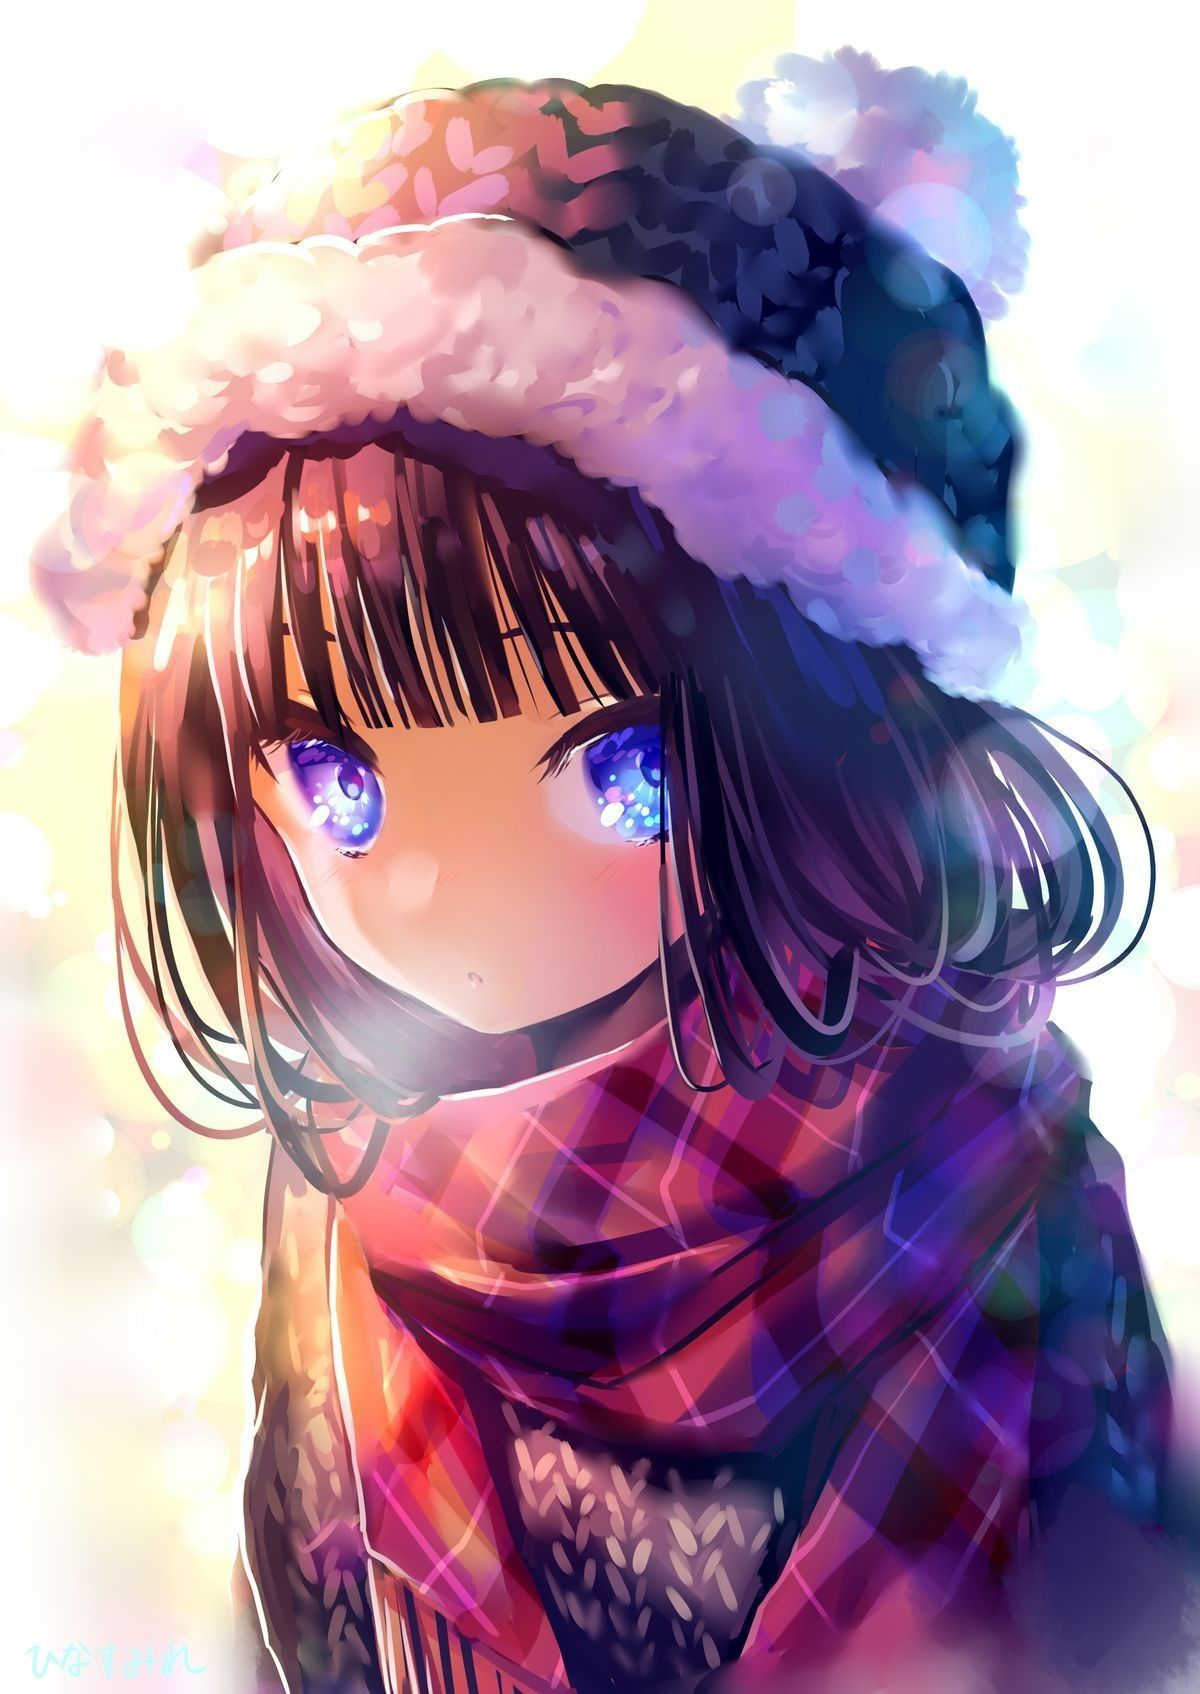 من يطلب صور فتاة بشعر اسود قصير و عيون بنفسجية Anime Drawings Anime Art Beautiful Anime Christmas